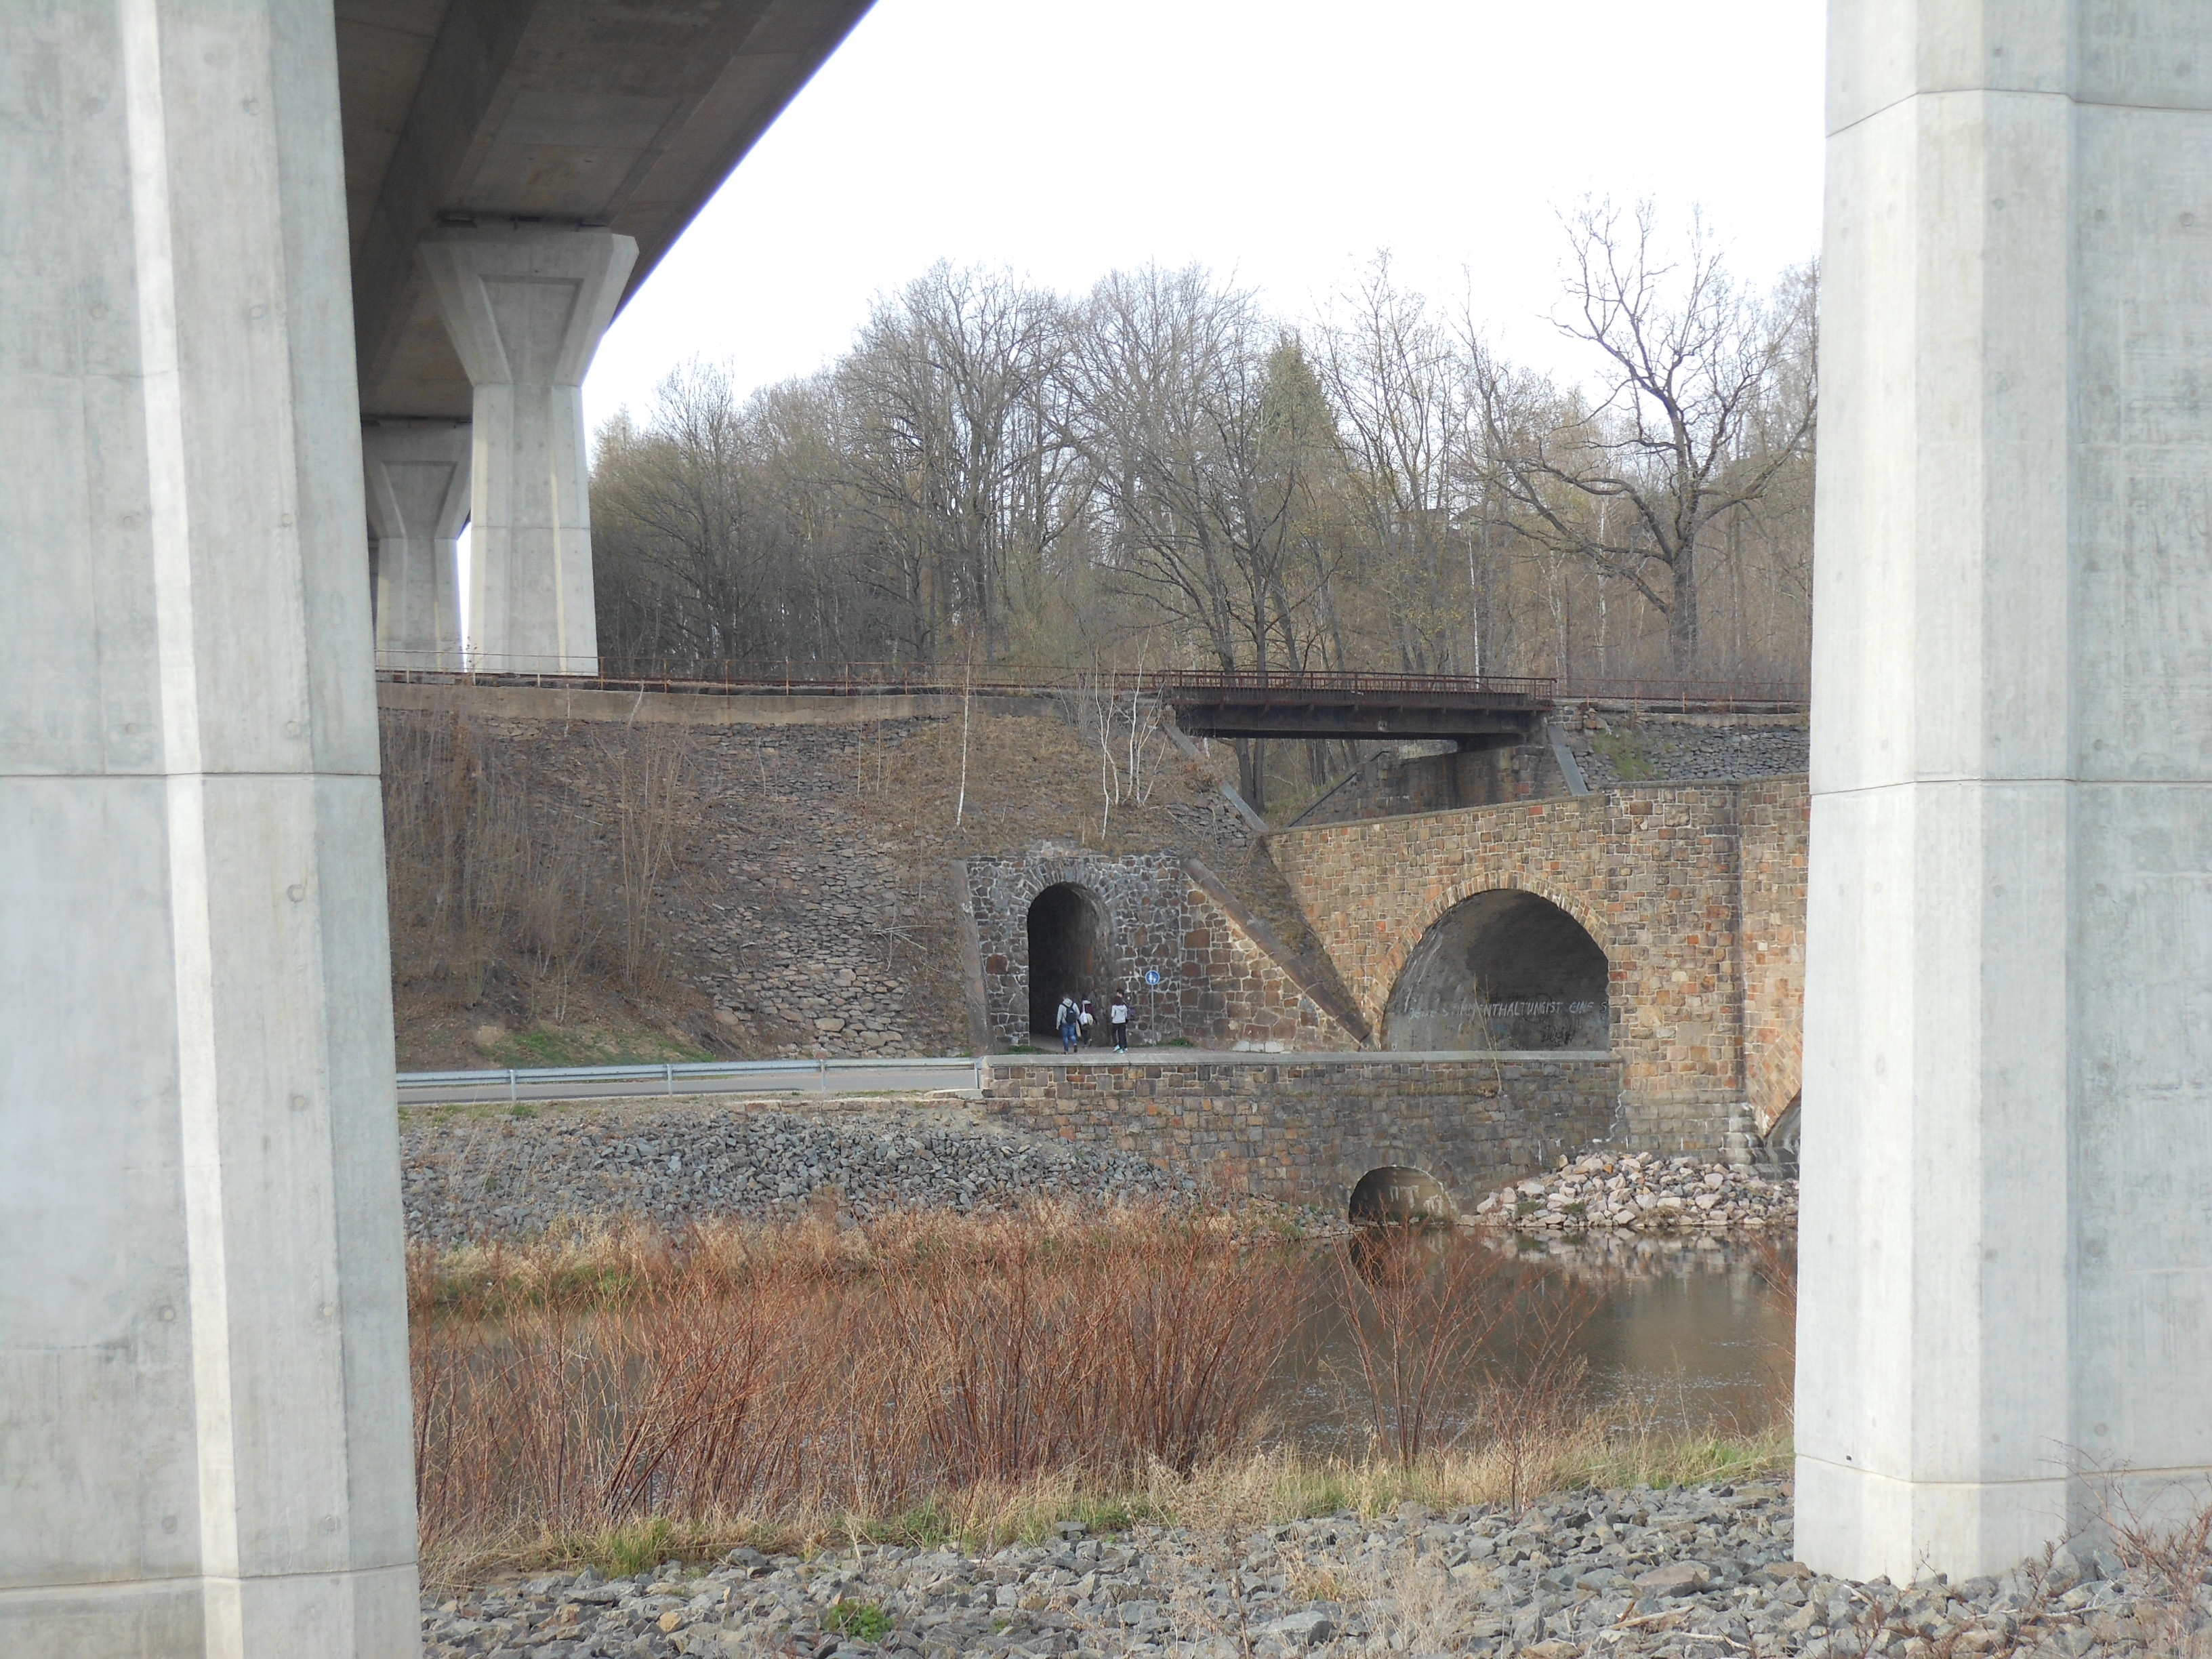 Peniger Brücken